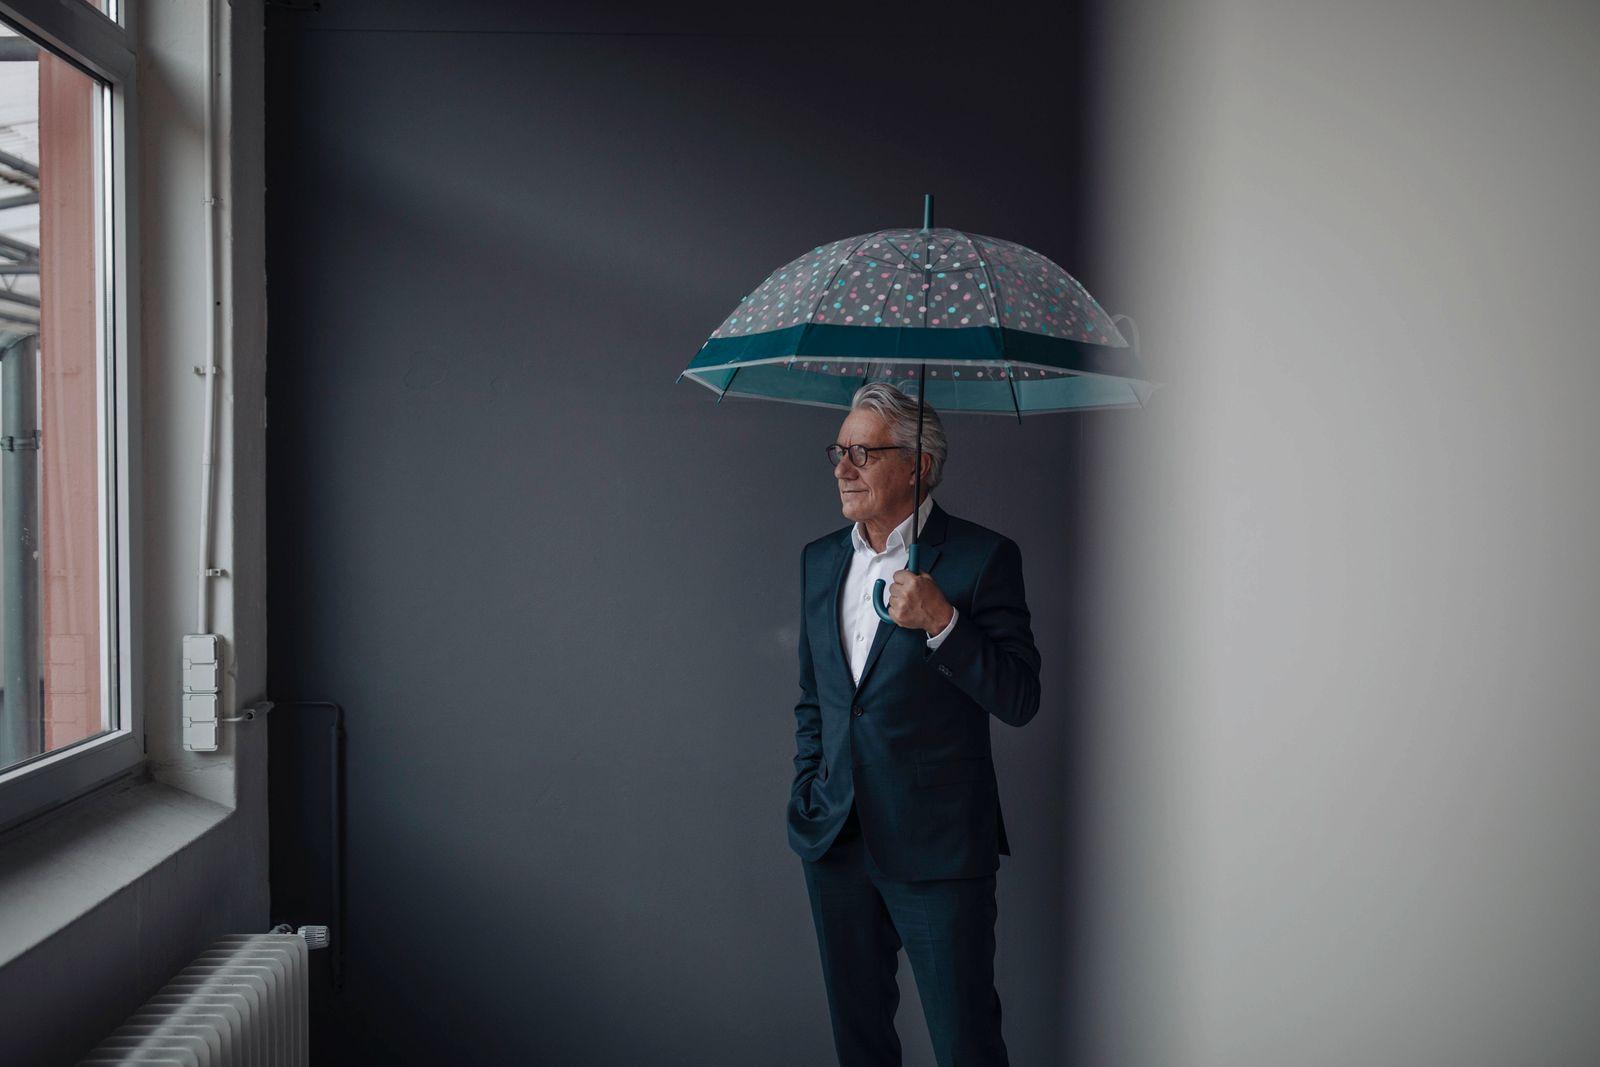 Senior businessman holding umbrella model released Symbolfoto property released PUBLICATIONxINxGERxSUIxAUTxHUNxONLY GUS